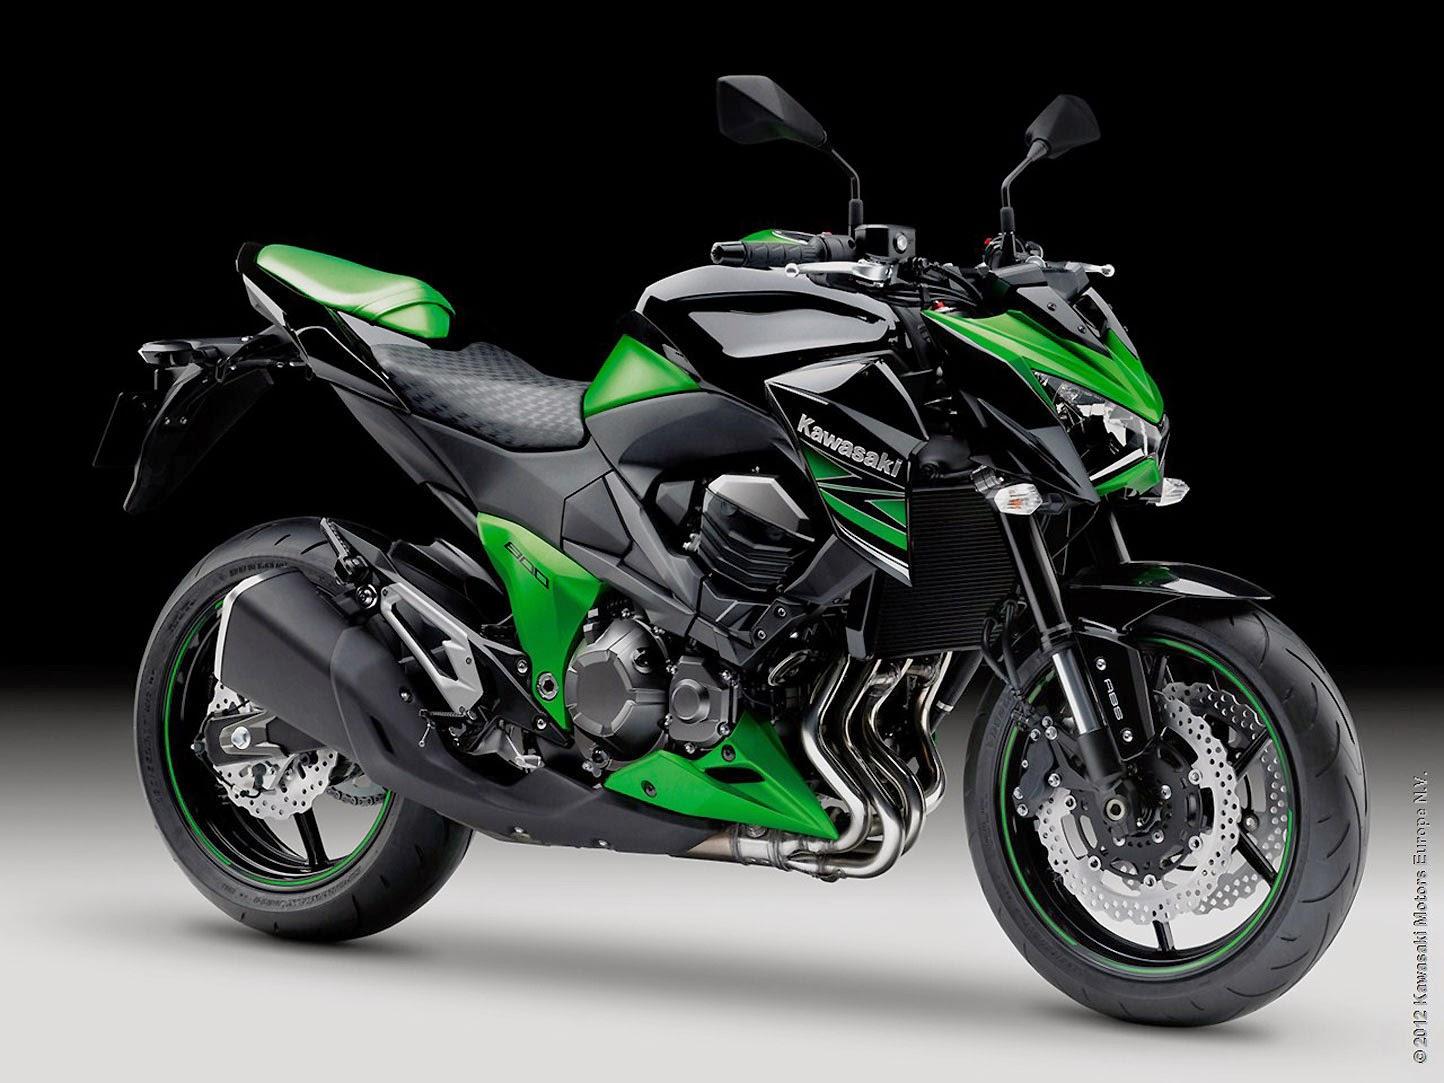 99 Gambar Motor Kawasaki Ninja Z250 Terupdate Gubuk Modifikasi